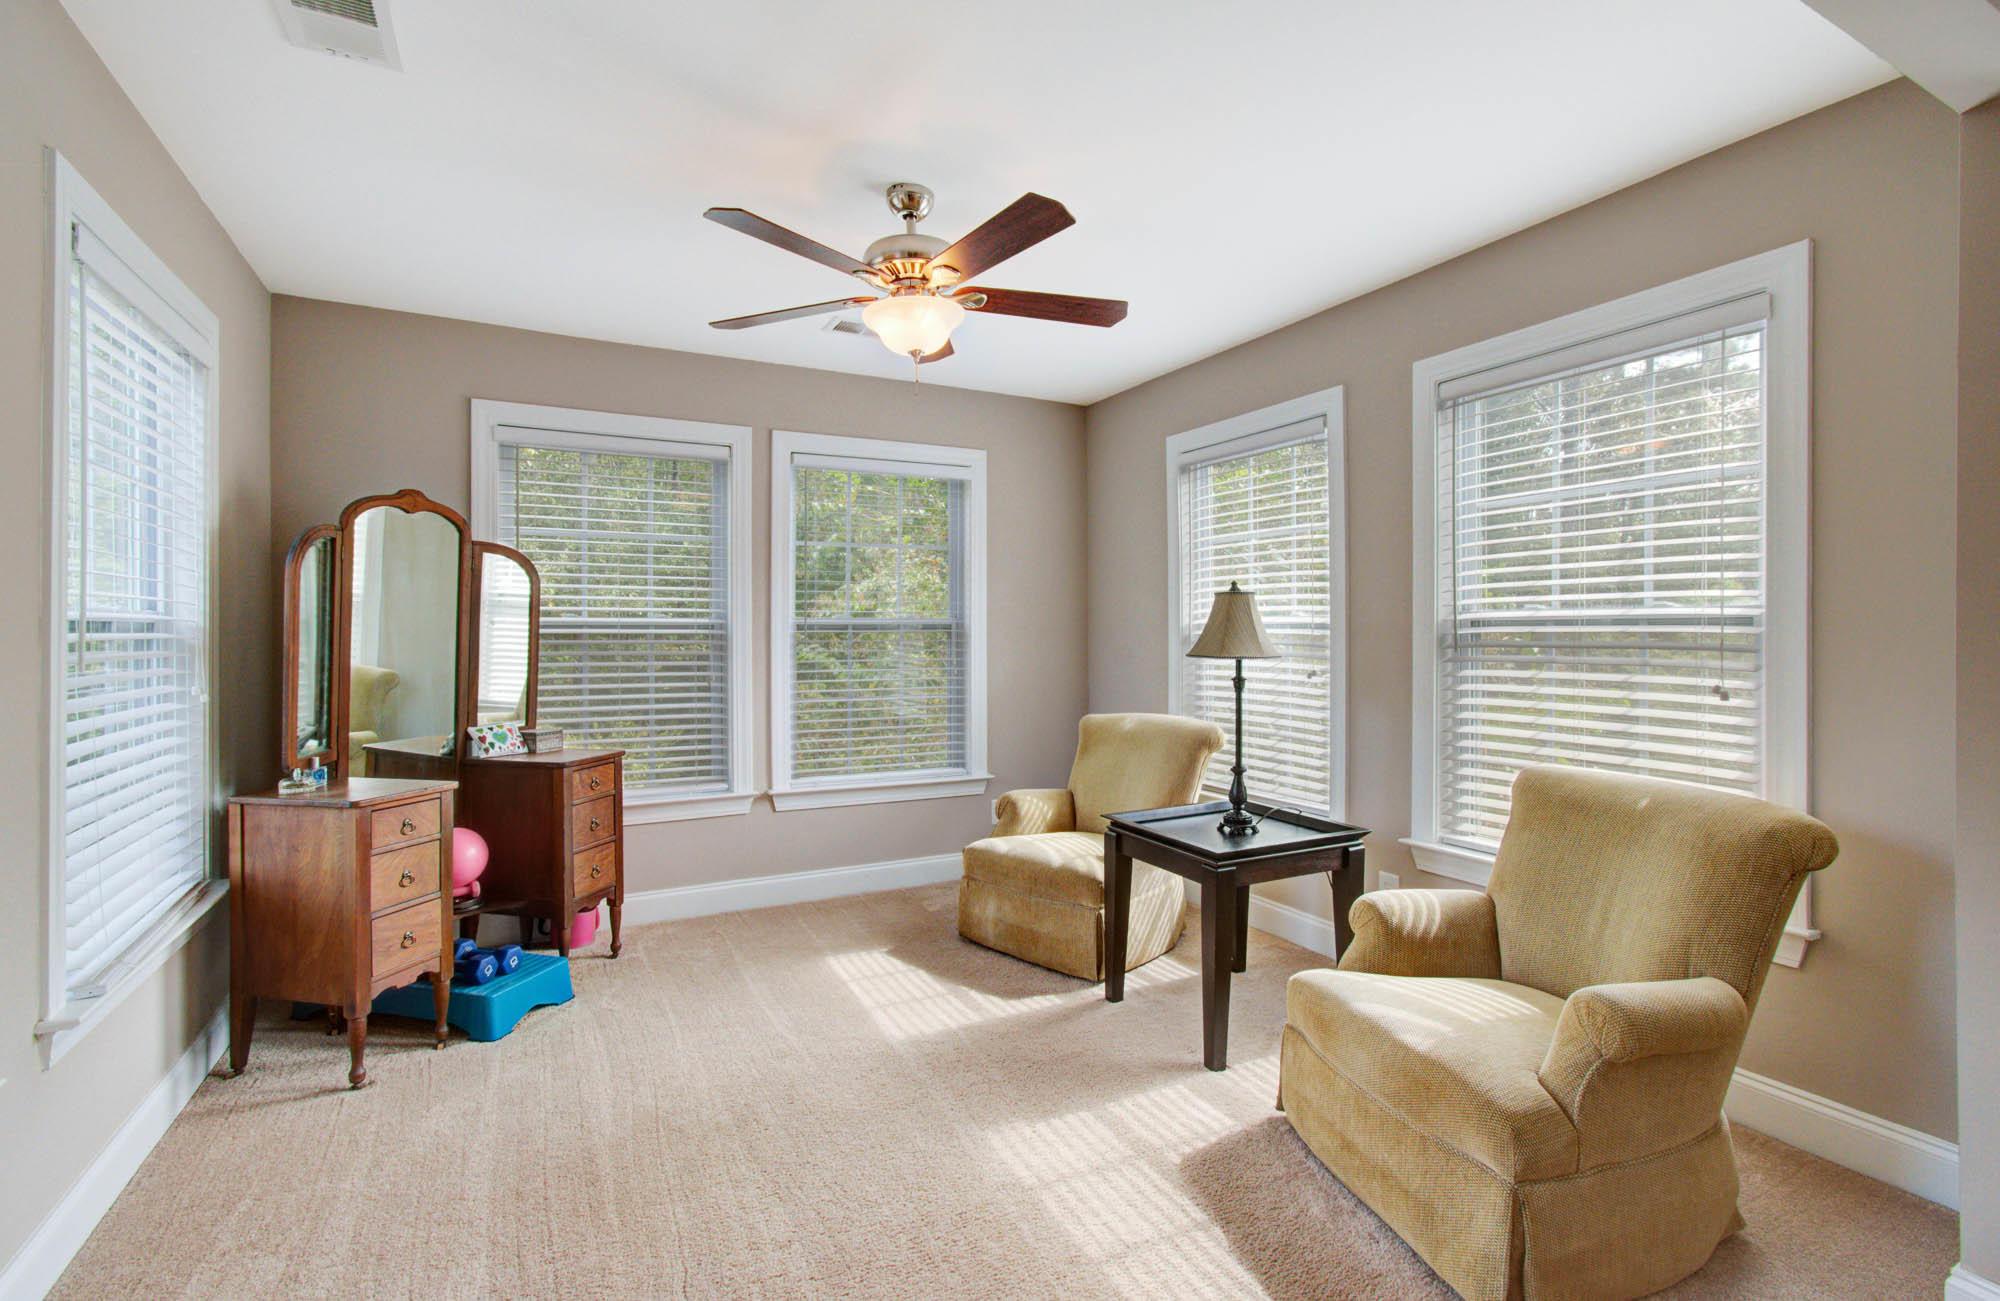 Indigo Palms Homes For Sale - 8535 Majestic, North Charleston, SC - 16